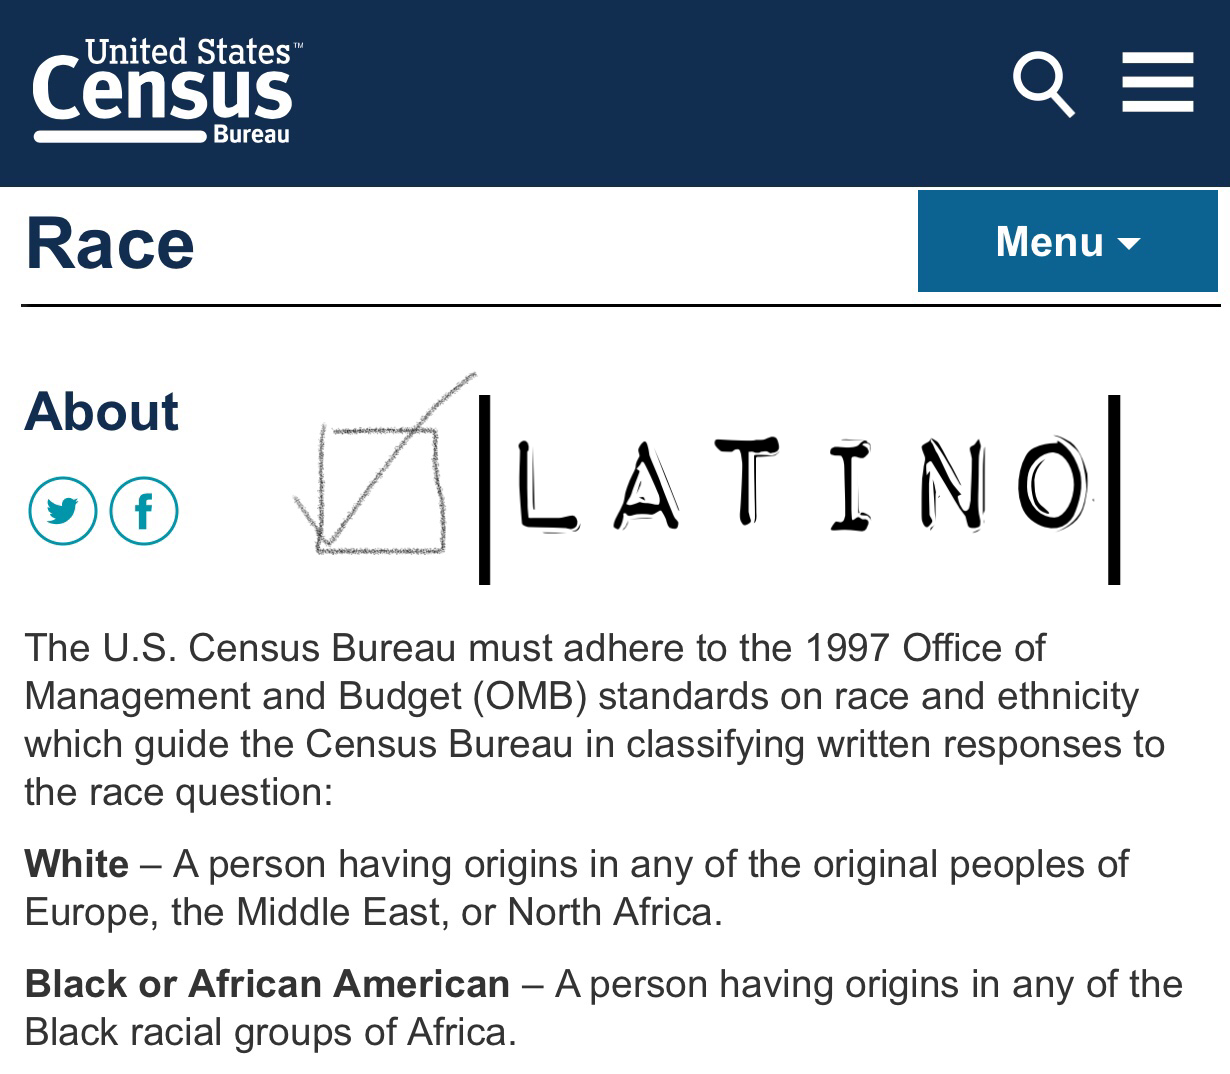 Are Latinos Black or White, President Trump?